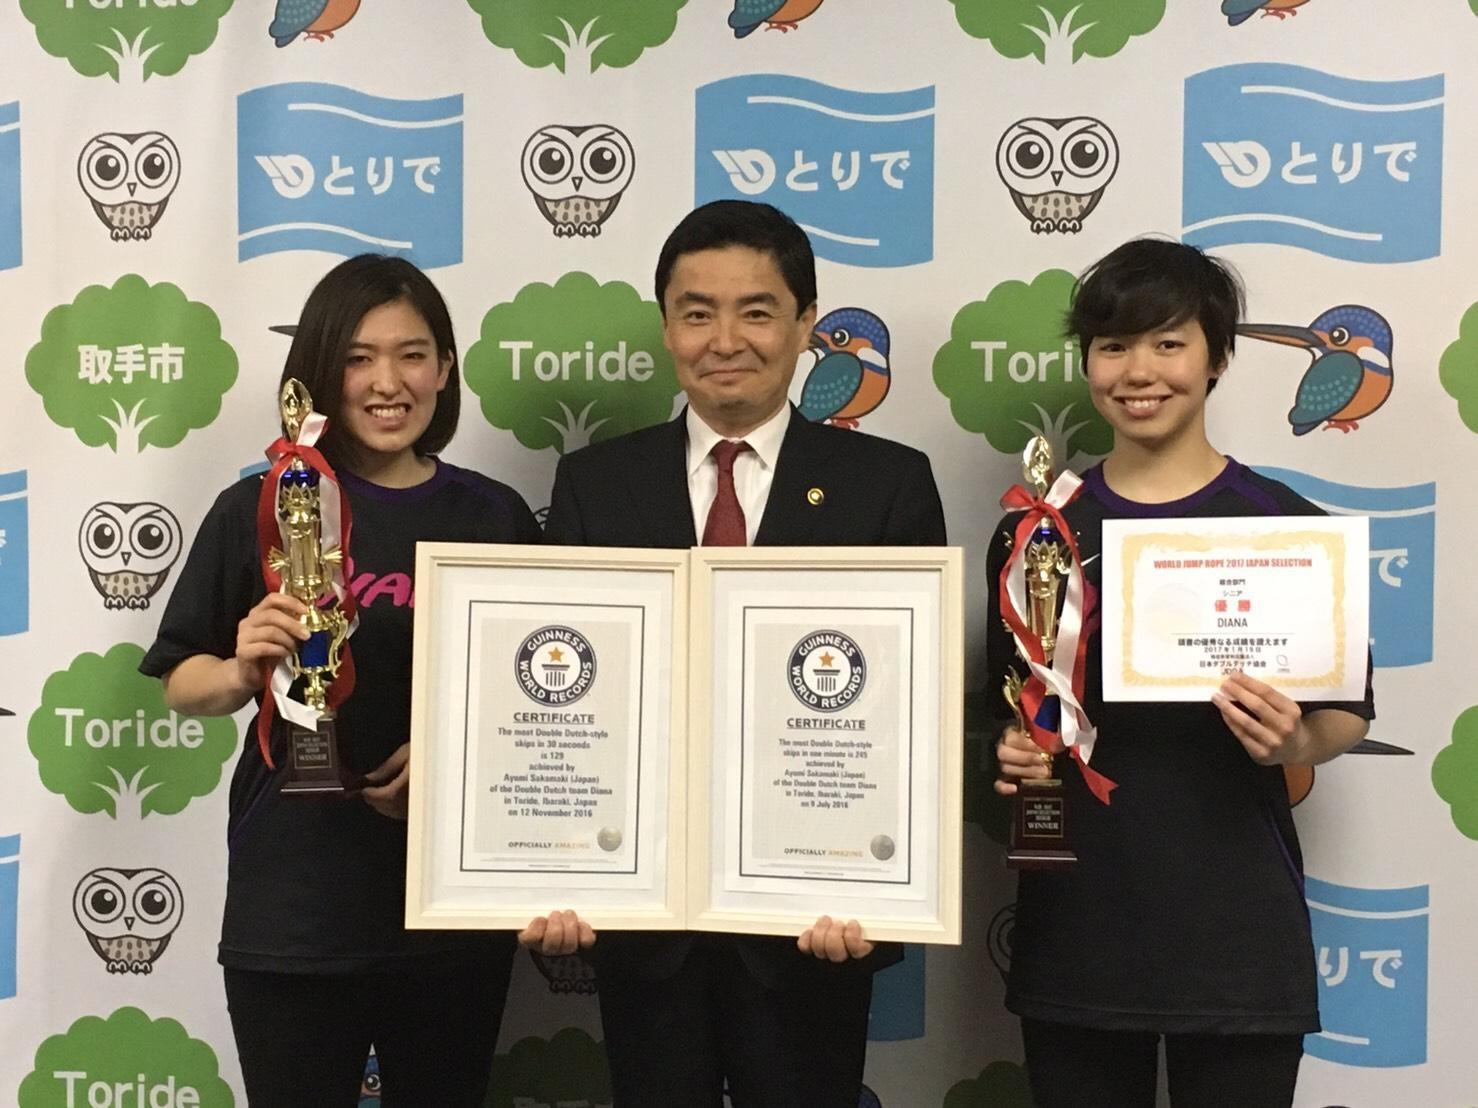 http://news.yoshimoto.co.jp/20170419102925-b06635e339d48d7b04a9e126d7dfc80597eb6a55.jpg